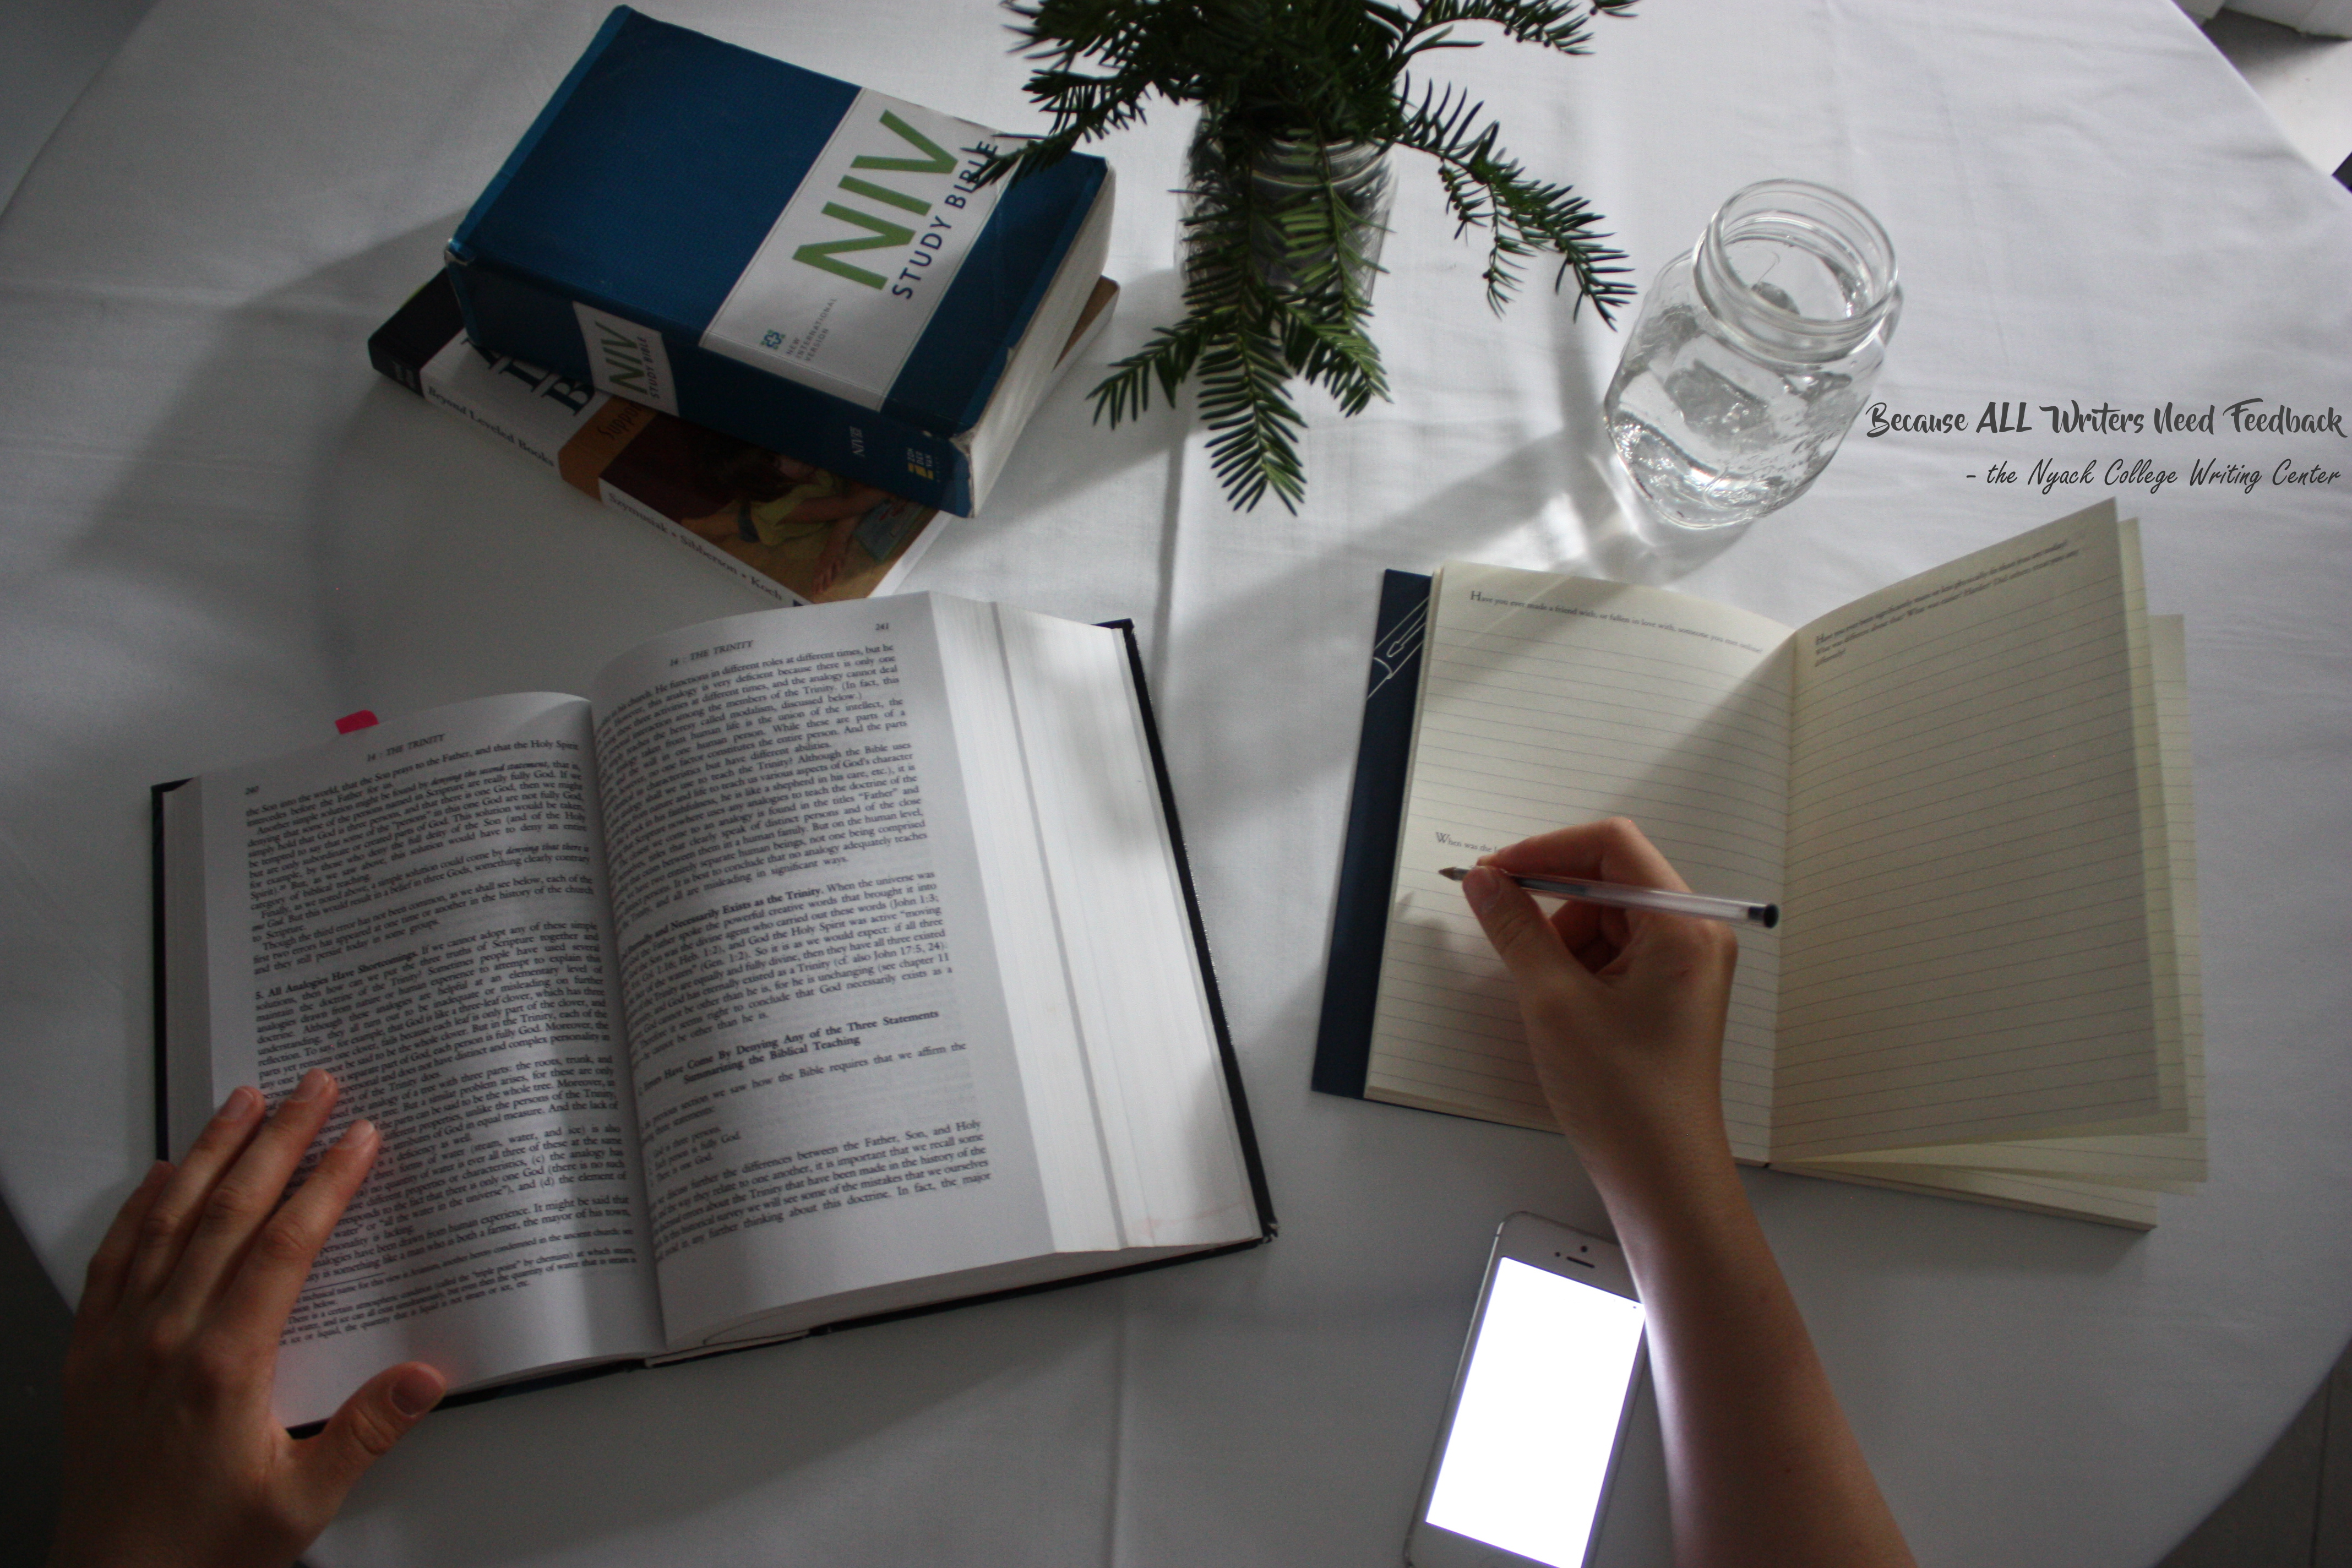 Nyack College Writing Center_Undergrad Resources